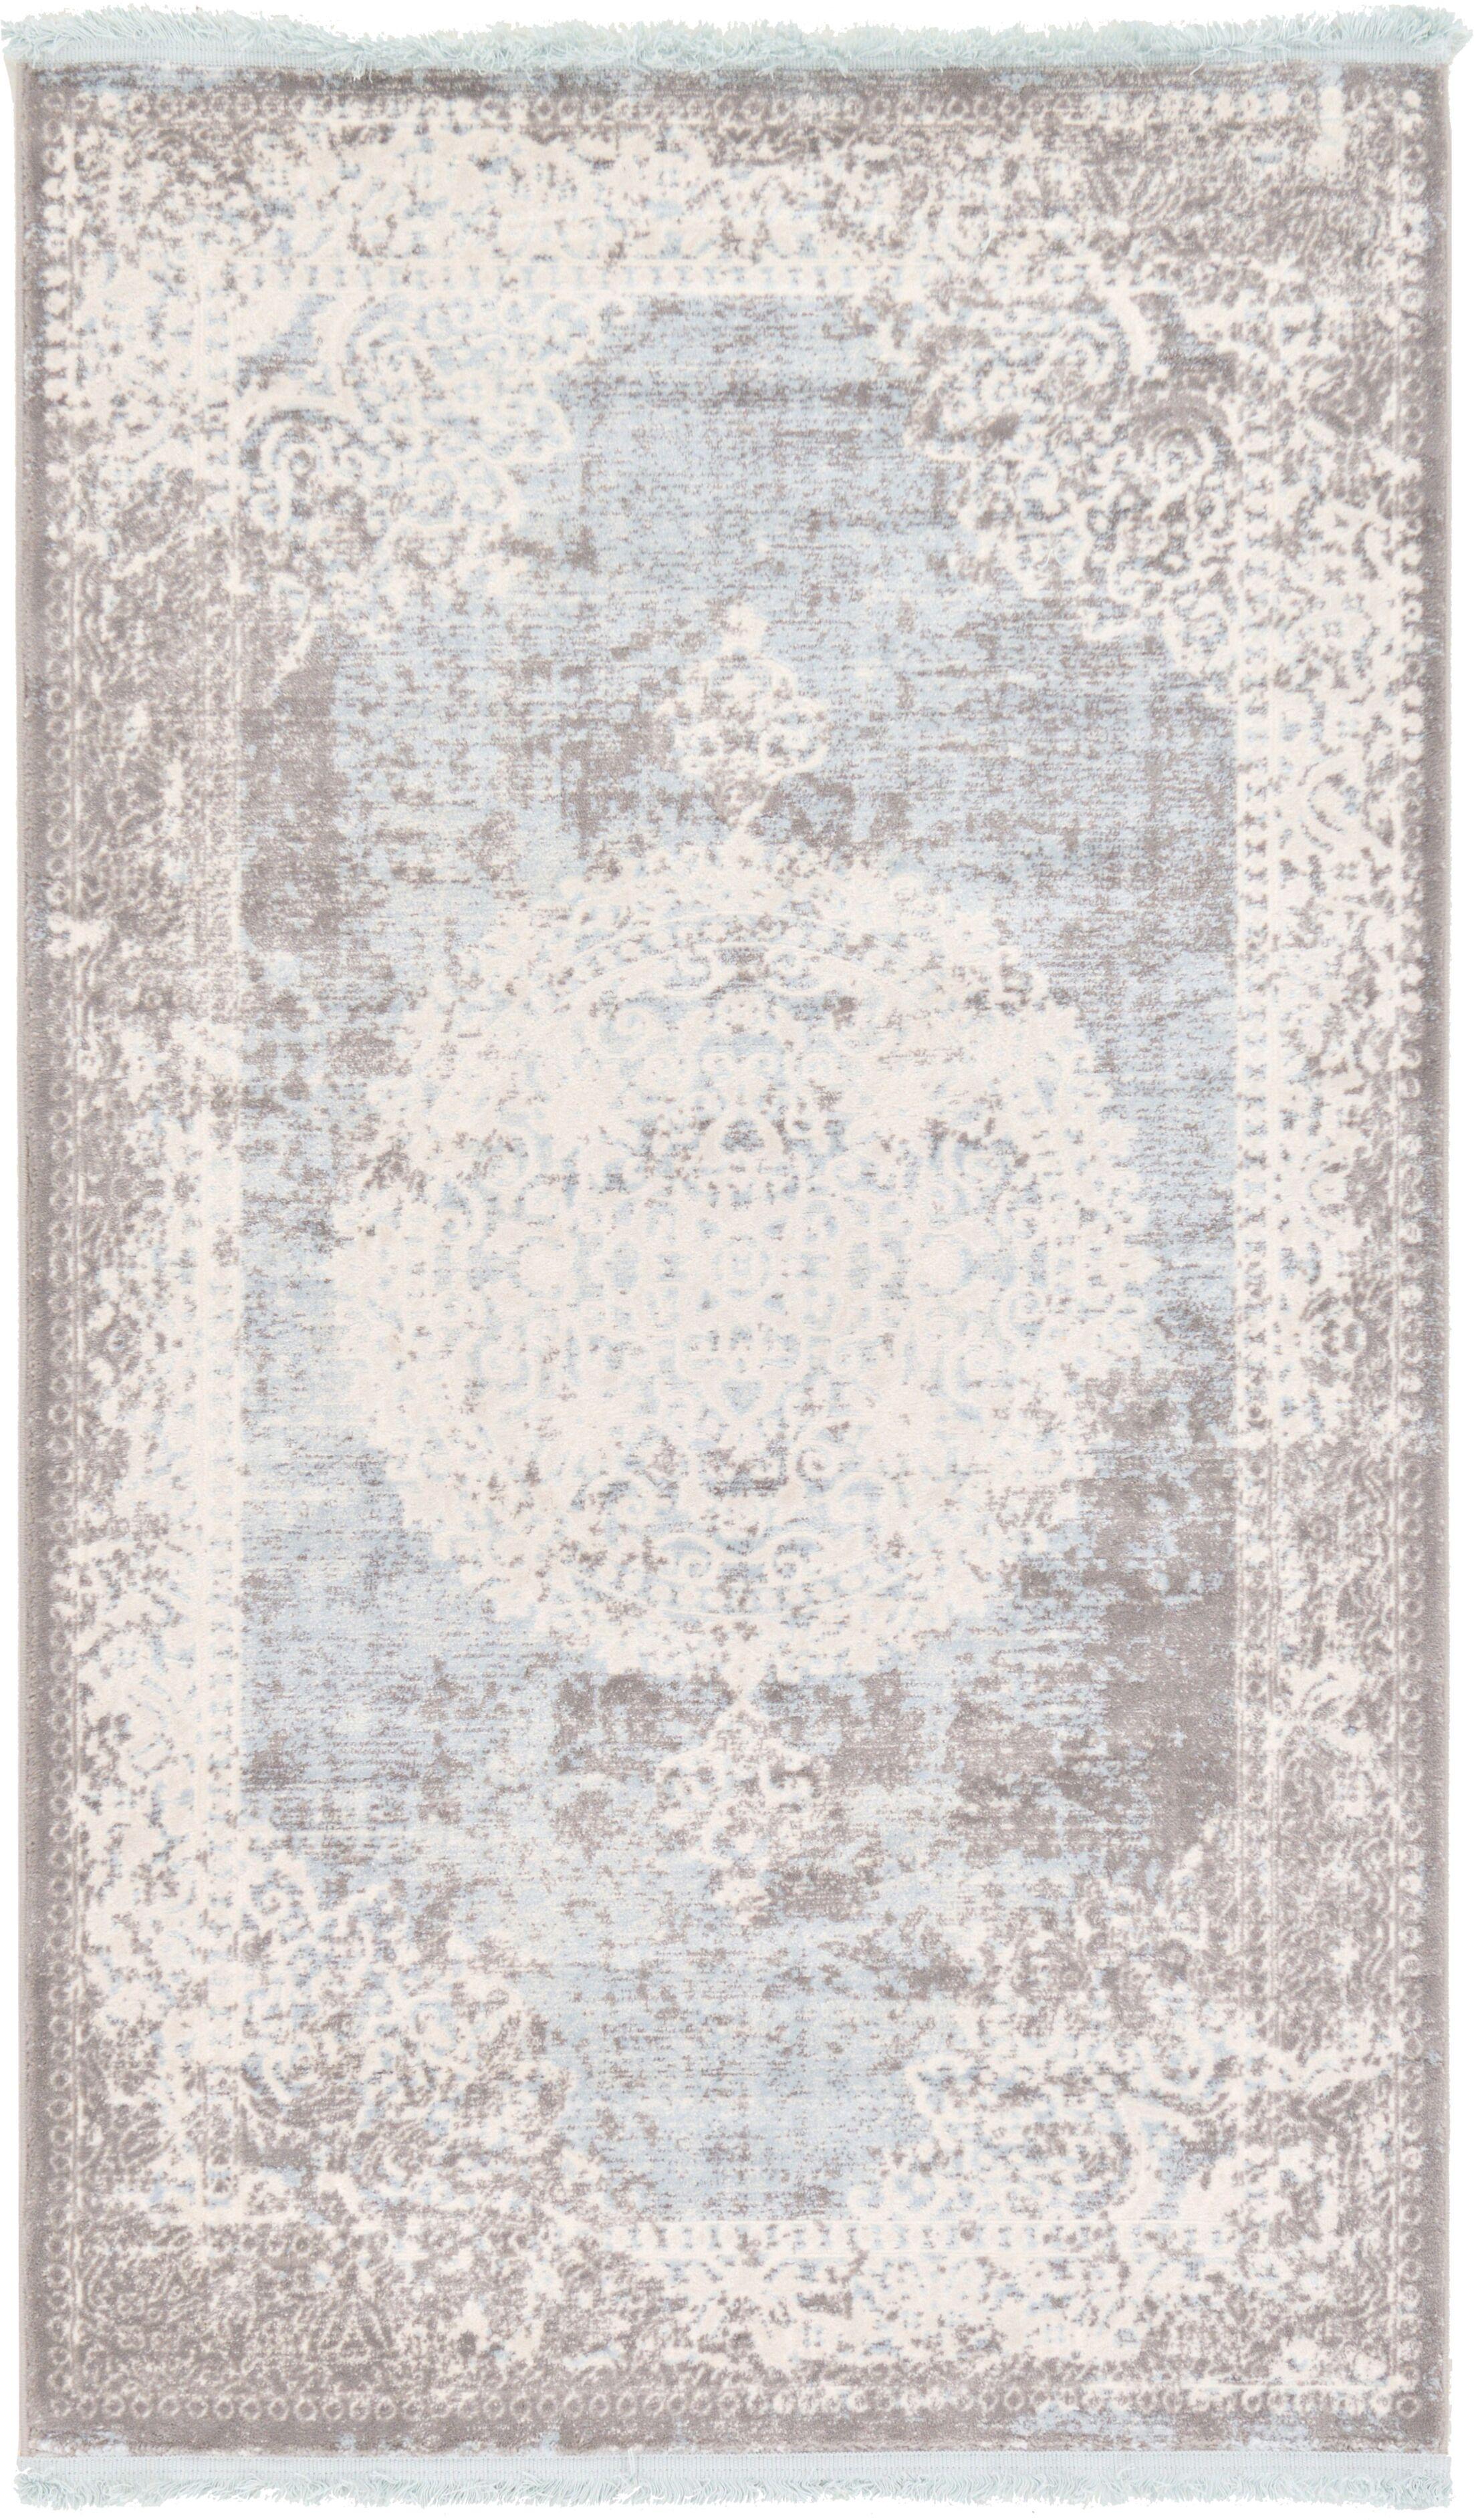 Twila Gray Area Rug Rug Size: Rectangle 3'3 x 5'3